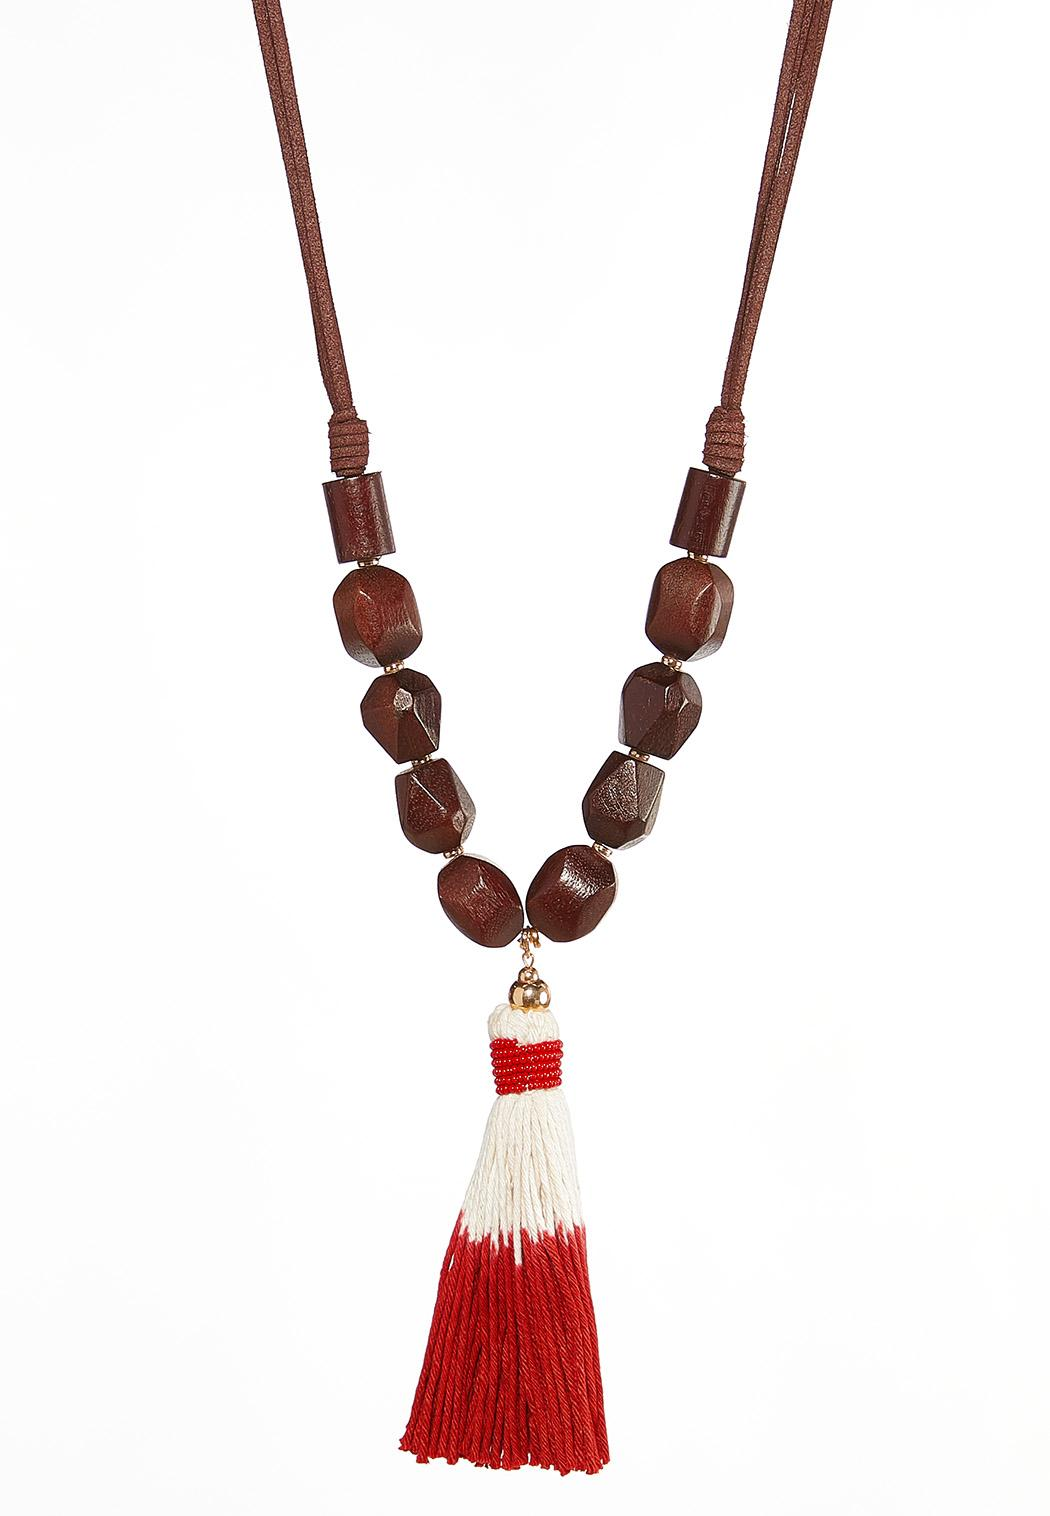 074220abbfdb3 Women s Fashion Necklaces